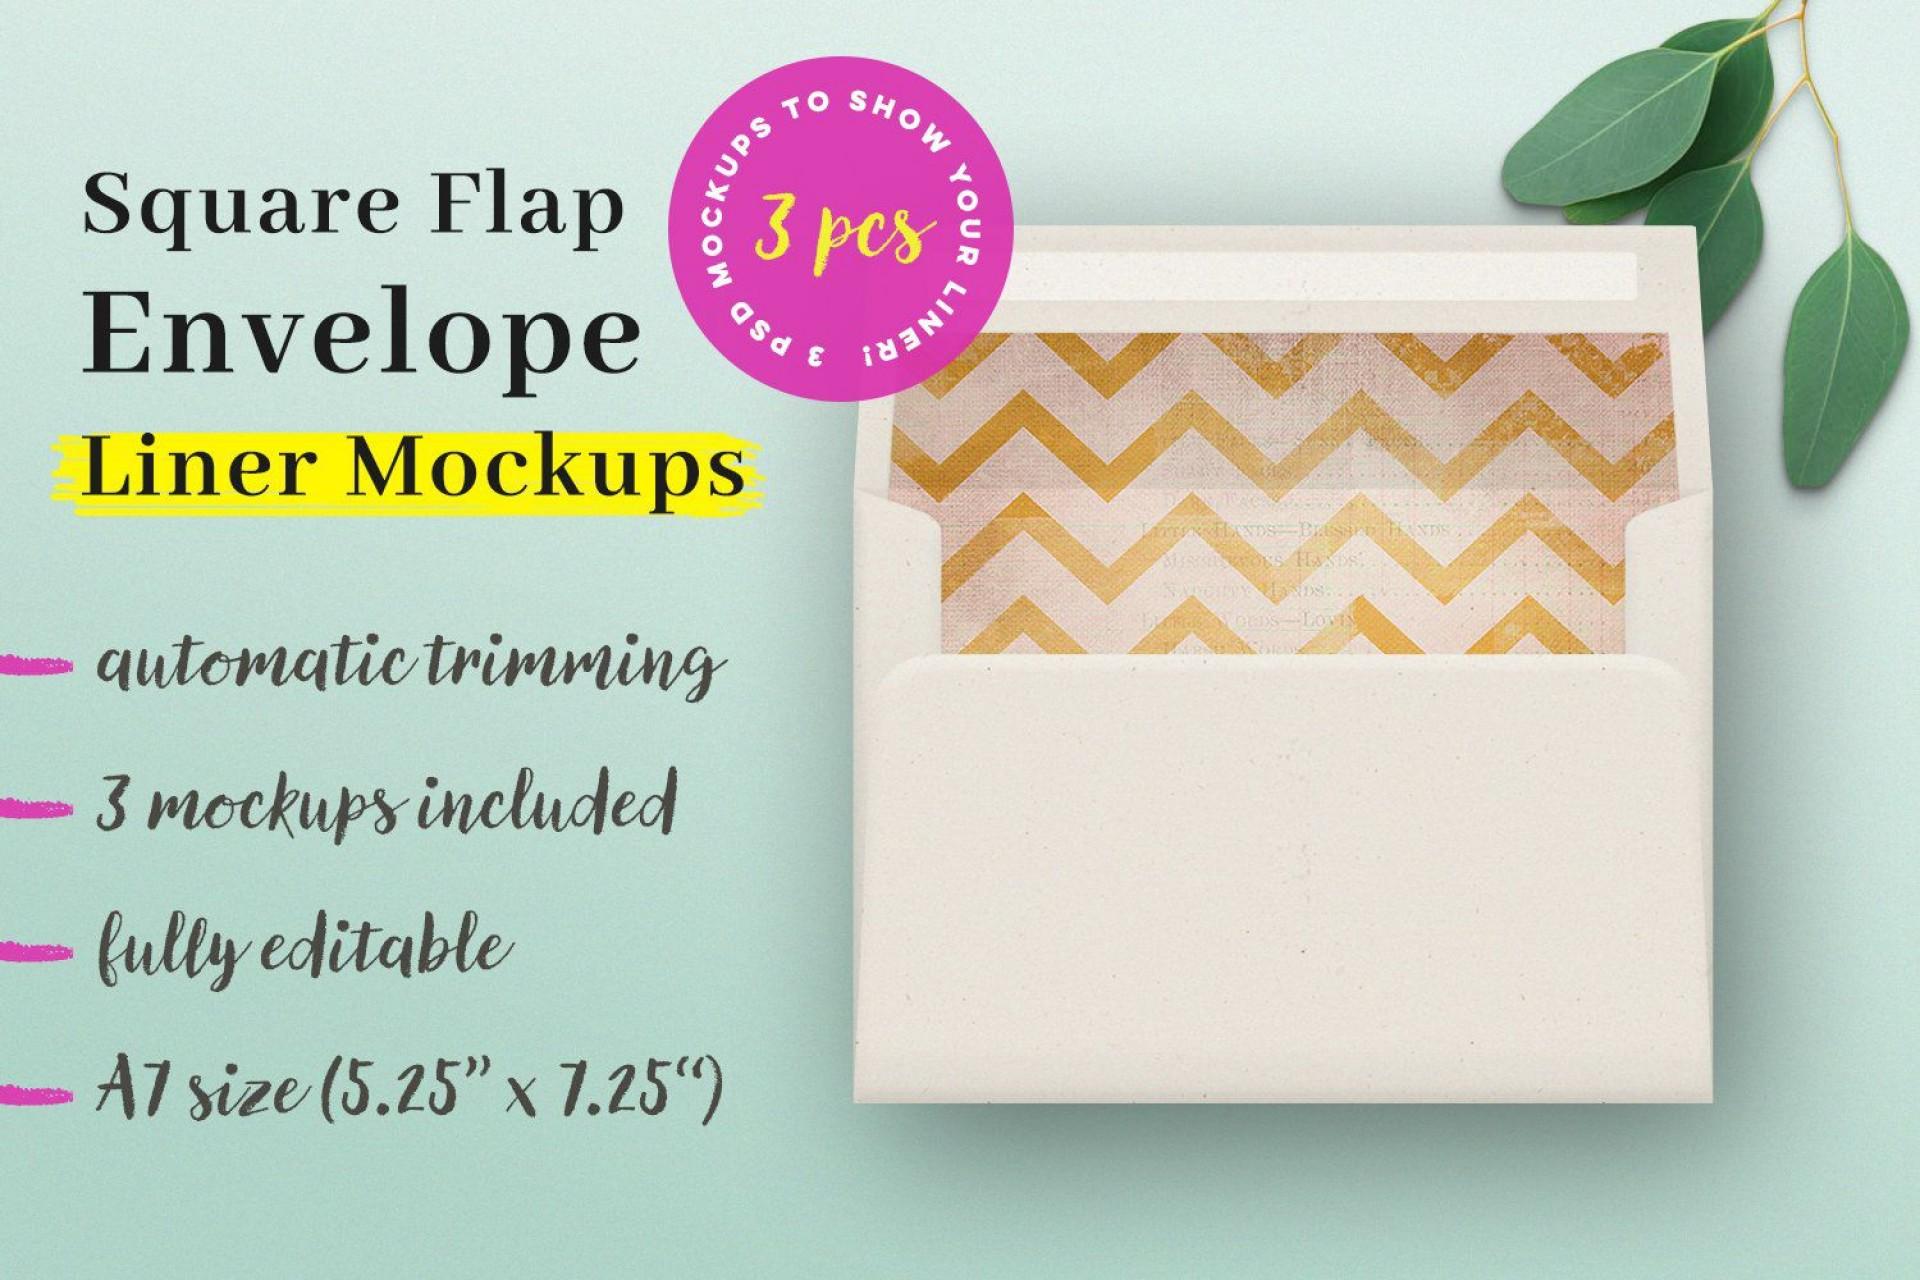 008 Excellent A7 Square Flap Envelope Liner Template High Definition 1920